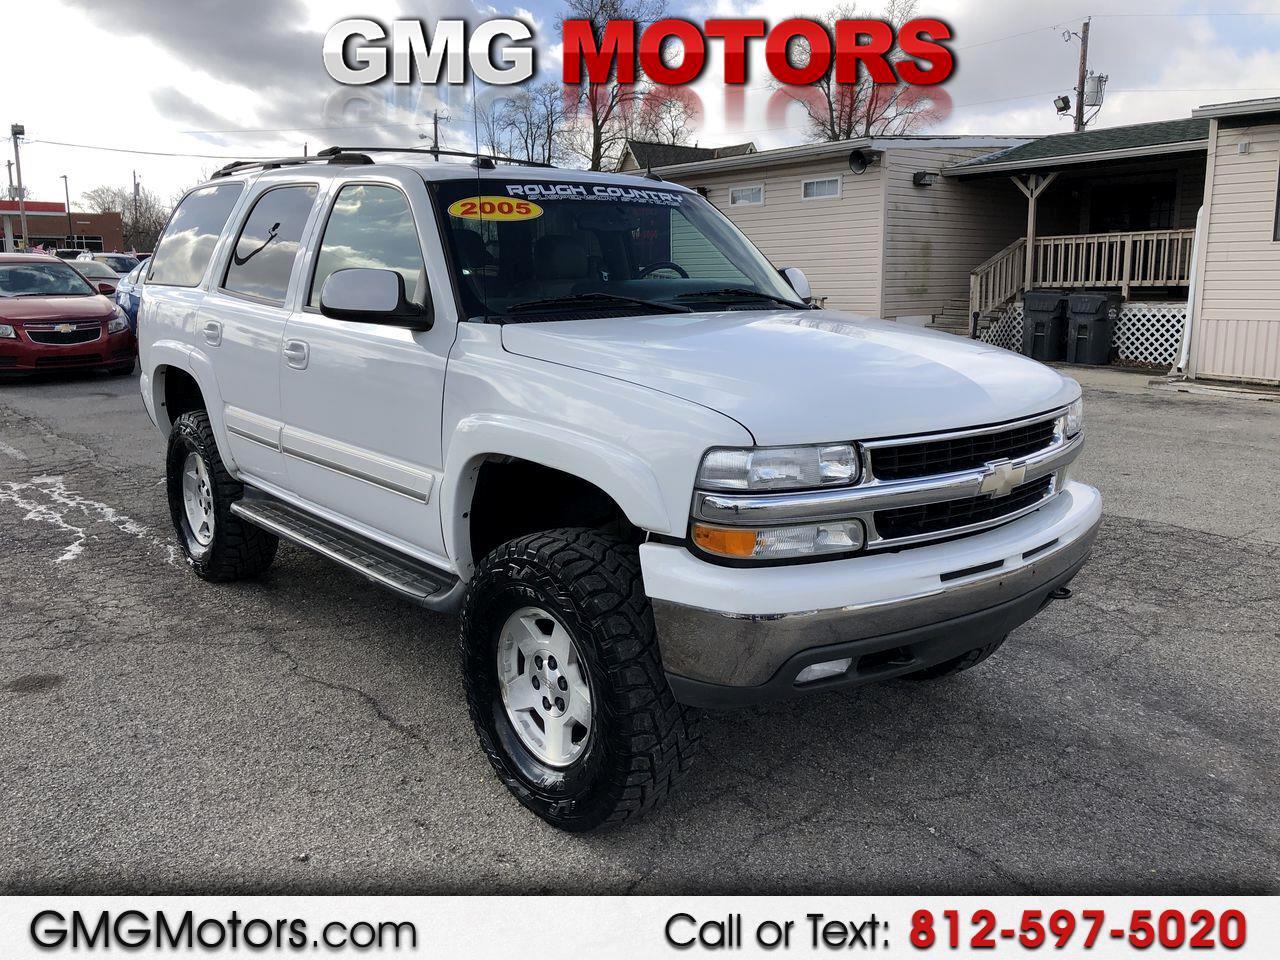 2005 Chevrolet Tahoe 4dr 1500 4WD LT